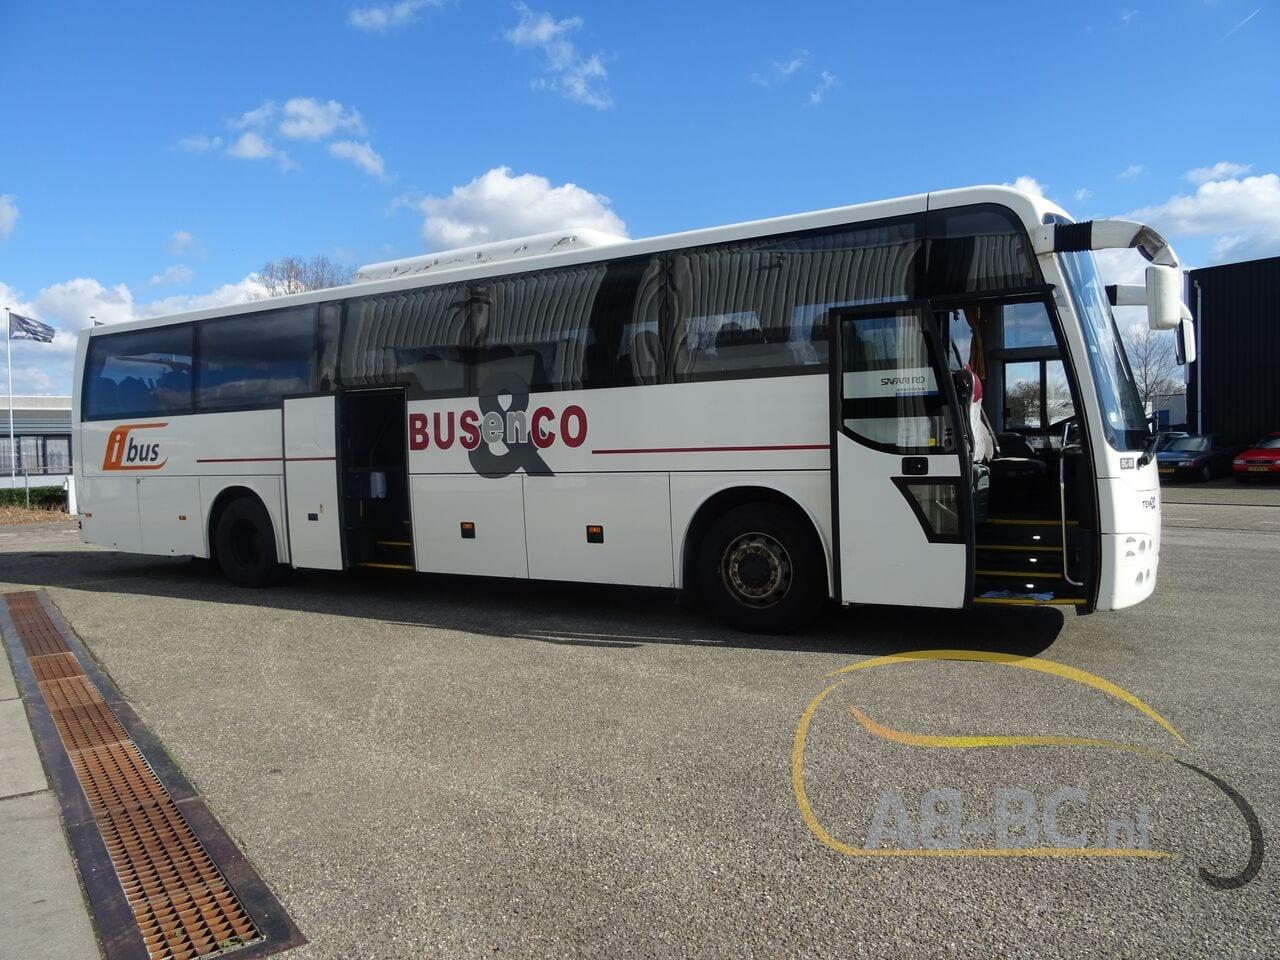 coach-busTEMSA-Safari-RD-53-Seats-DAF-Motor-12-mtr---1616164236431501153_big_c4b0b2bc4cb0f22715e4ffc93476263e--21031916283496651600